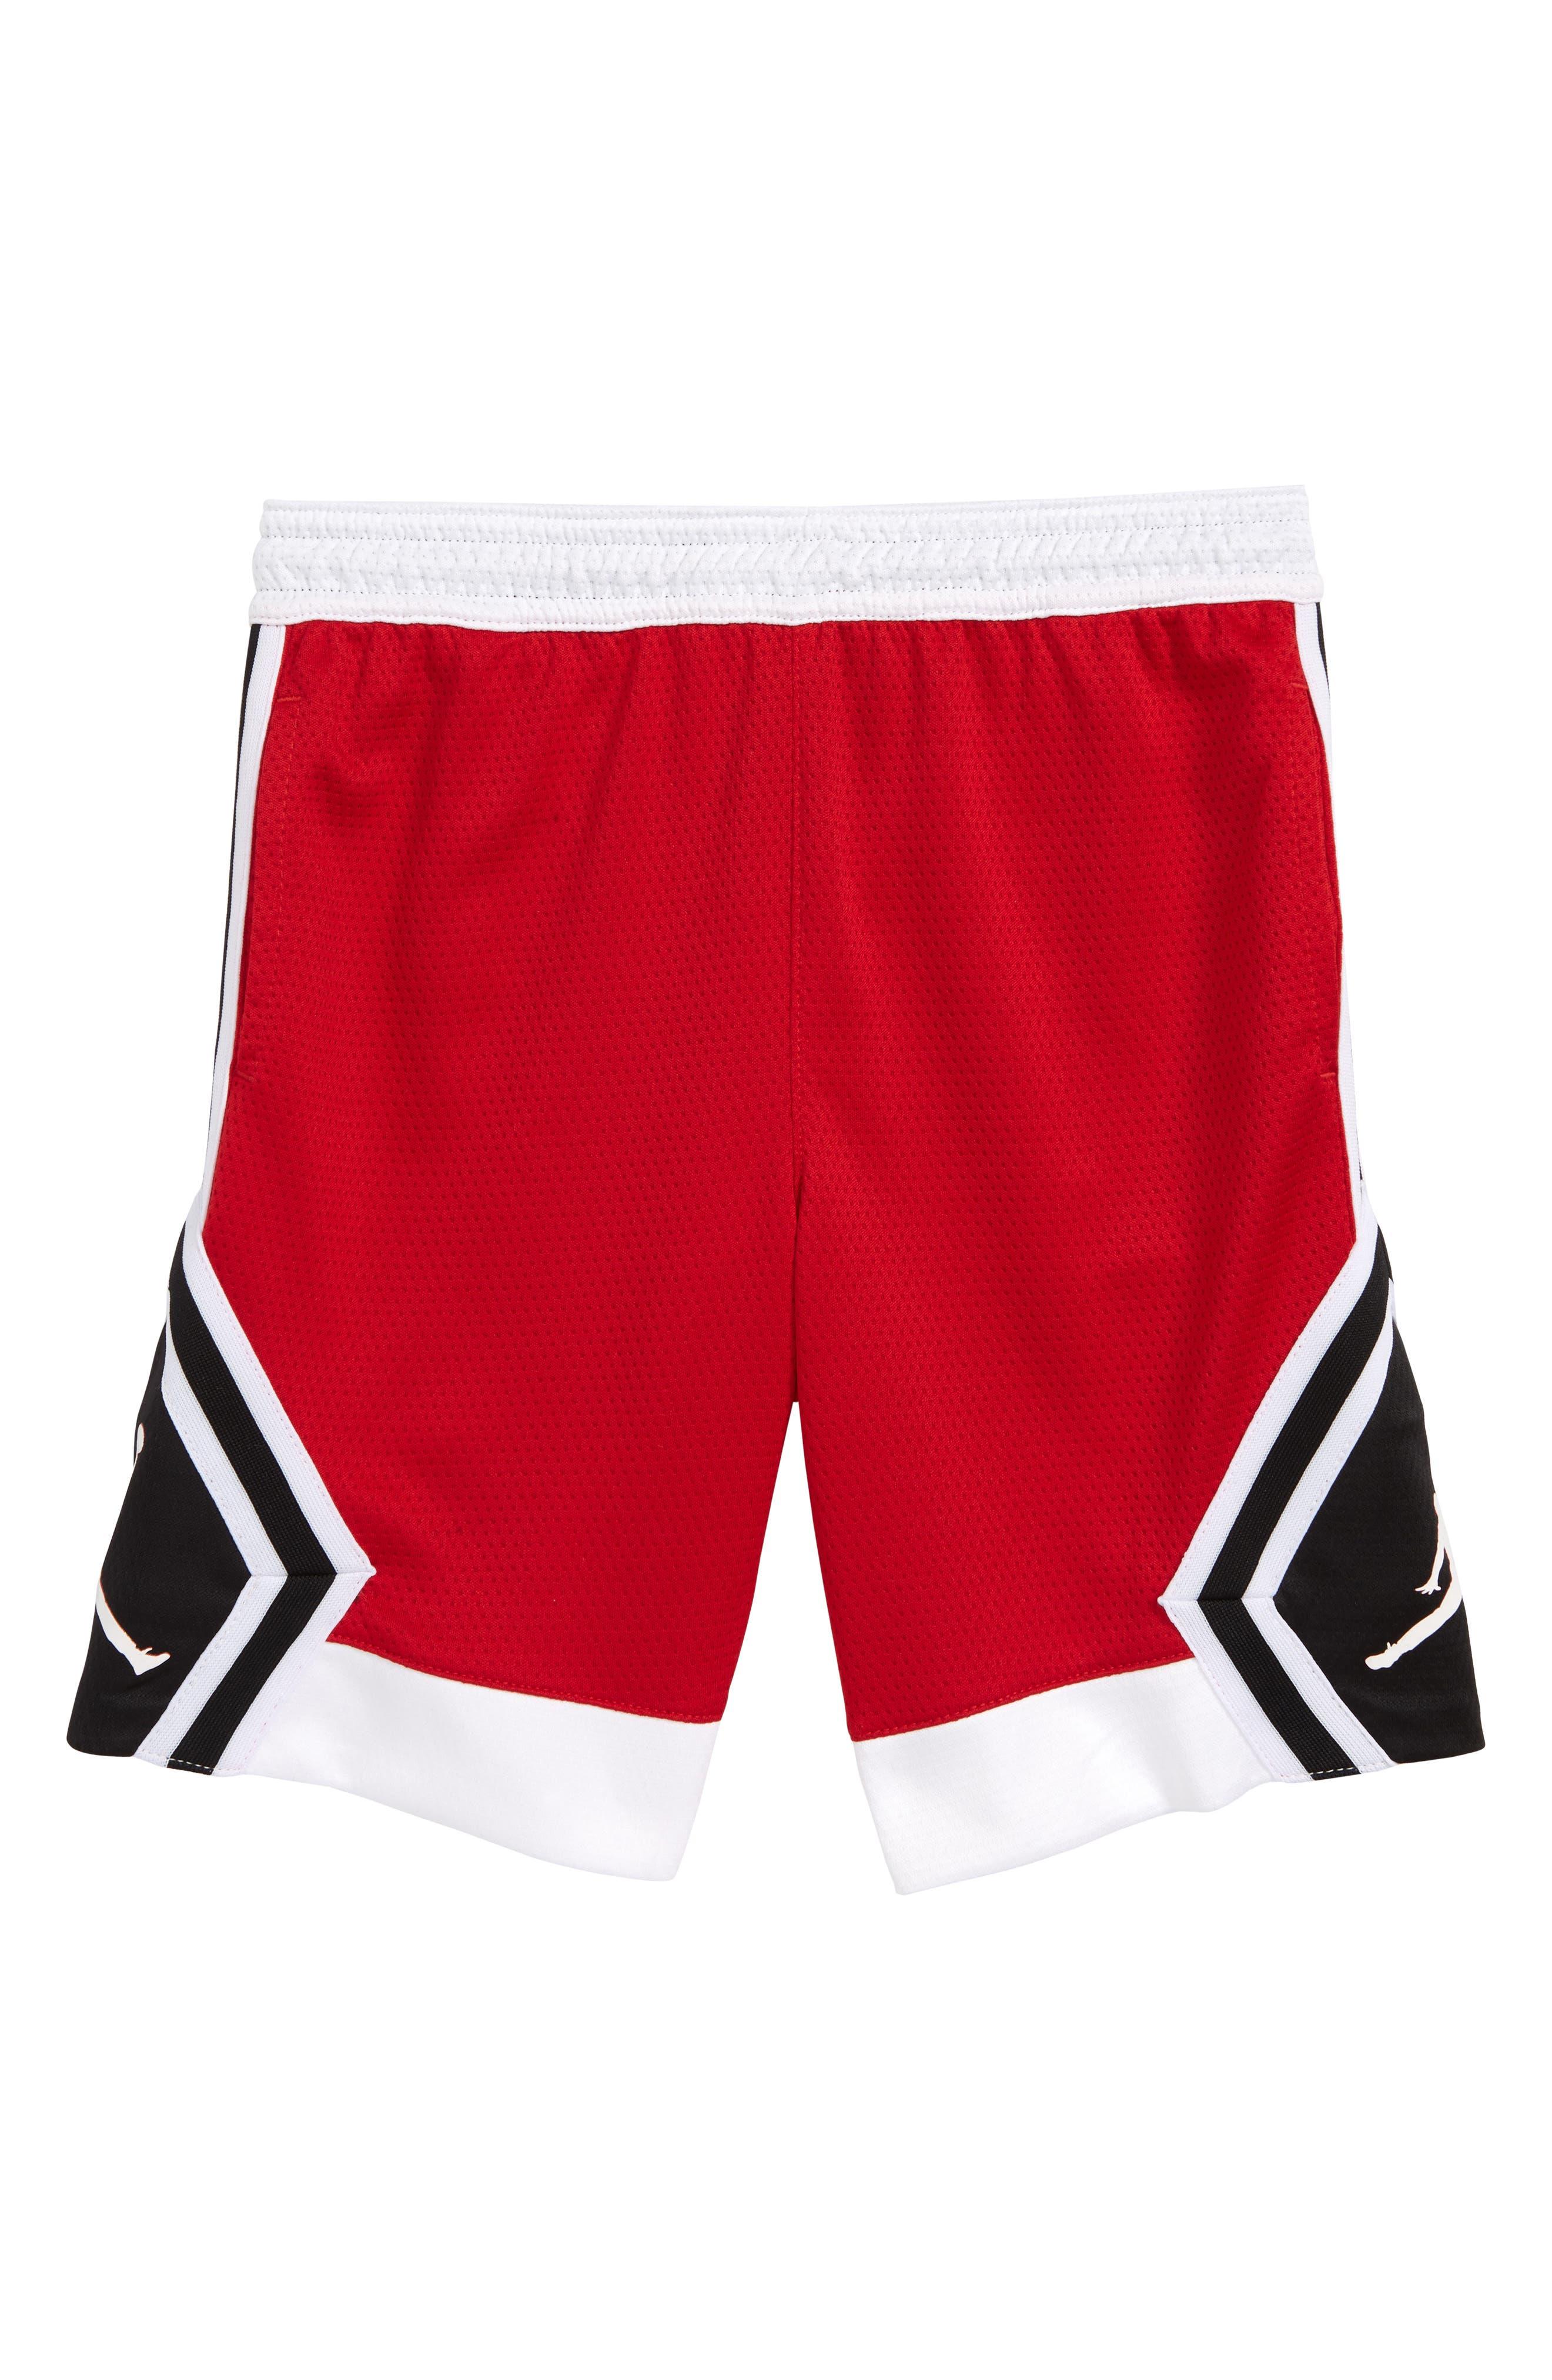 Jordan Rise Diamond Short,                         Main,                         color, GYM RED